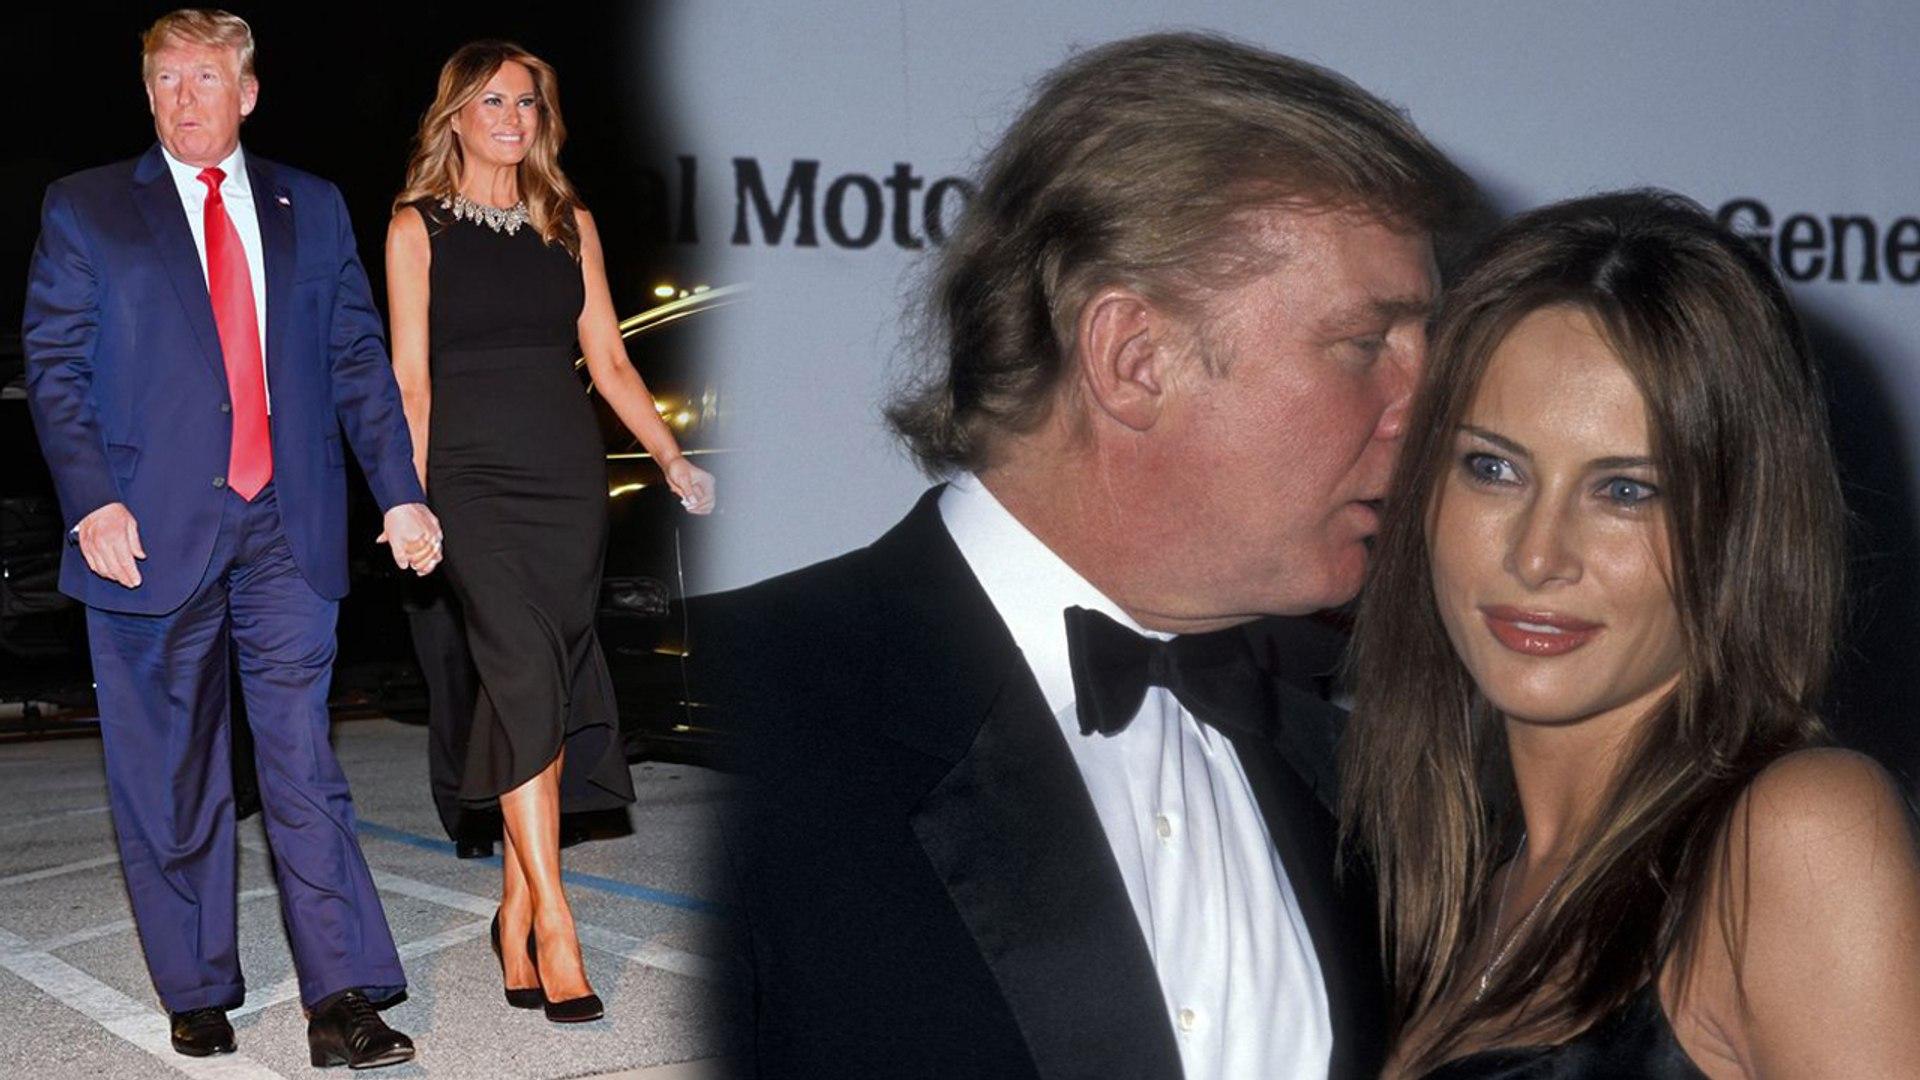 Donald Trump India Visit : Donald Trump Melania Love Story | Donald Trump Love Life | Boldsky